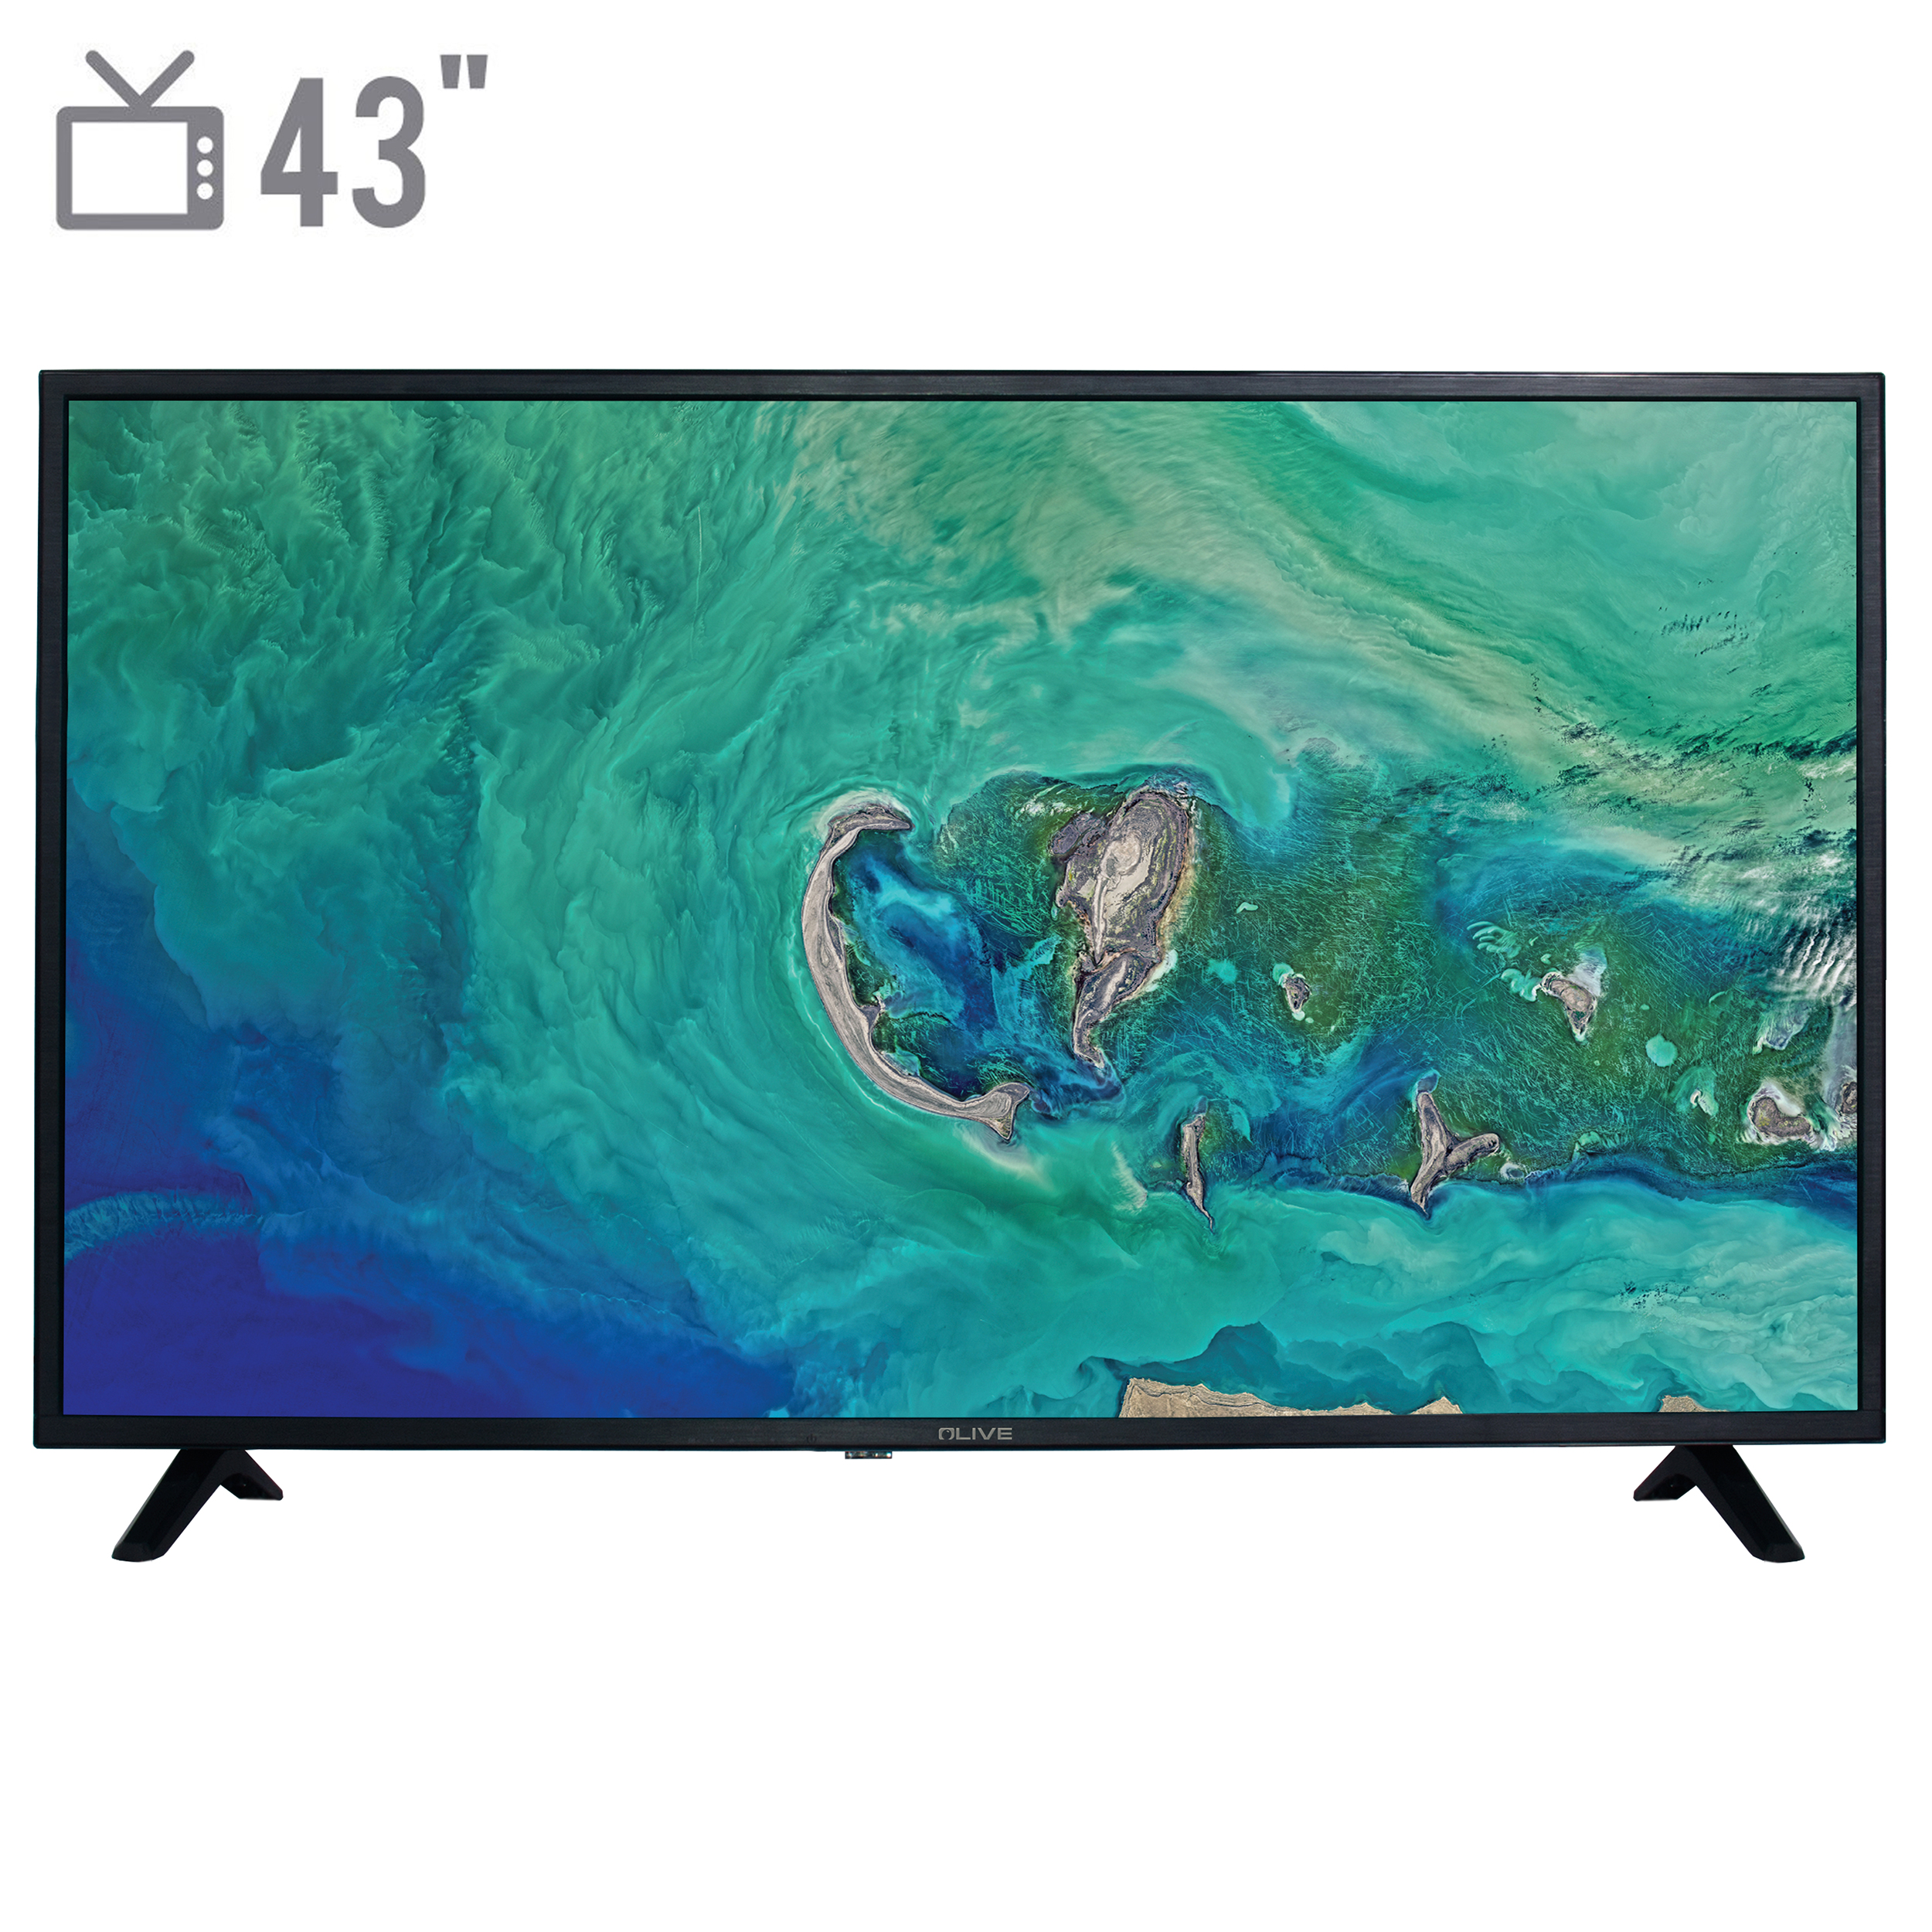 تلویزیون ال ای دی الیو مدل 43FA4410 سایز 43 اینچ